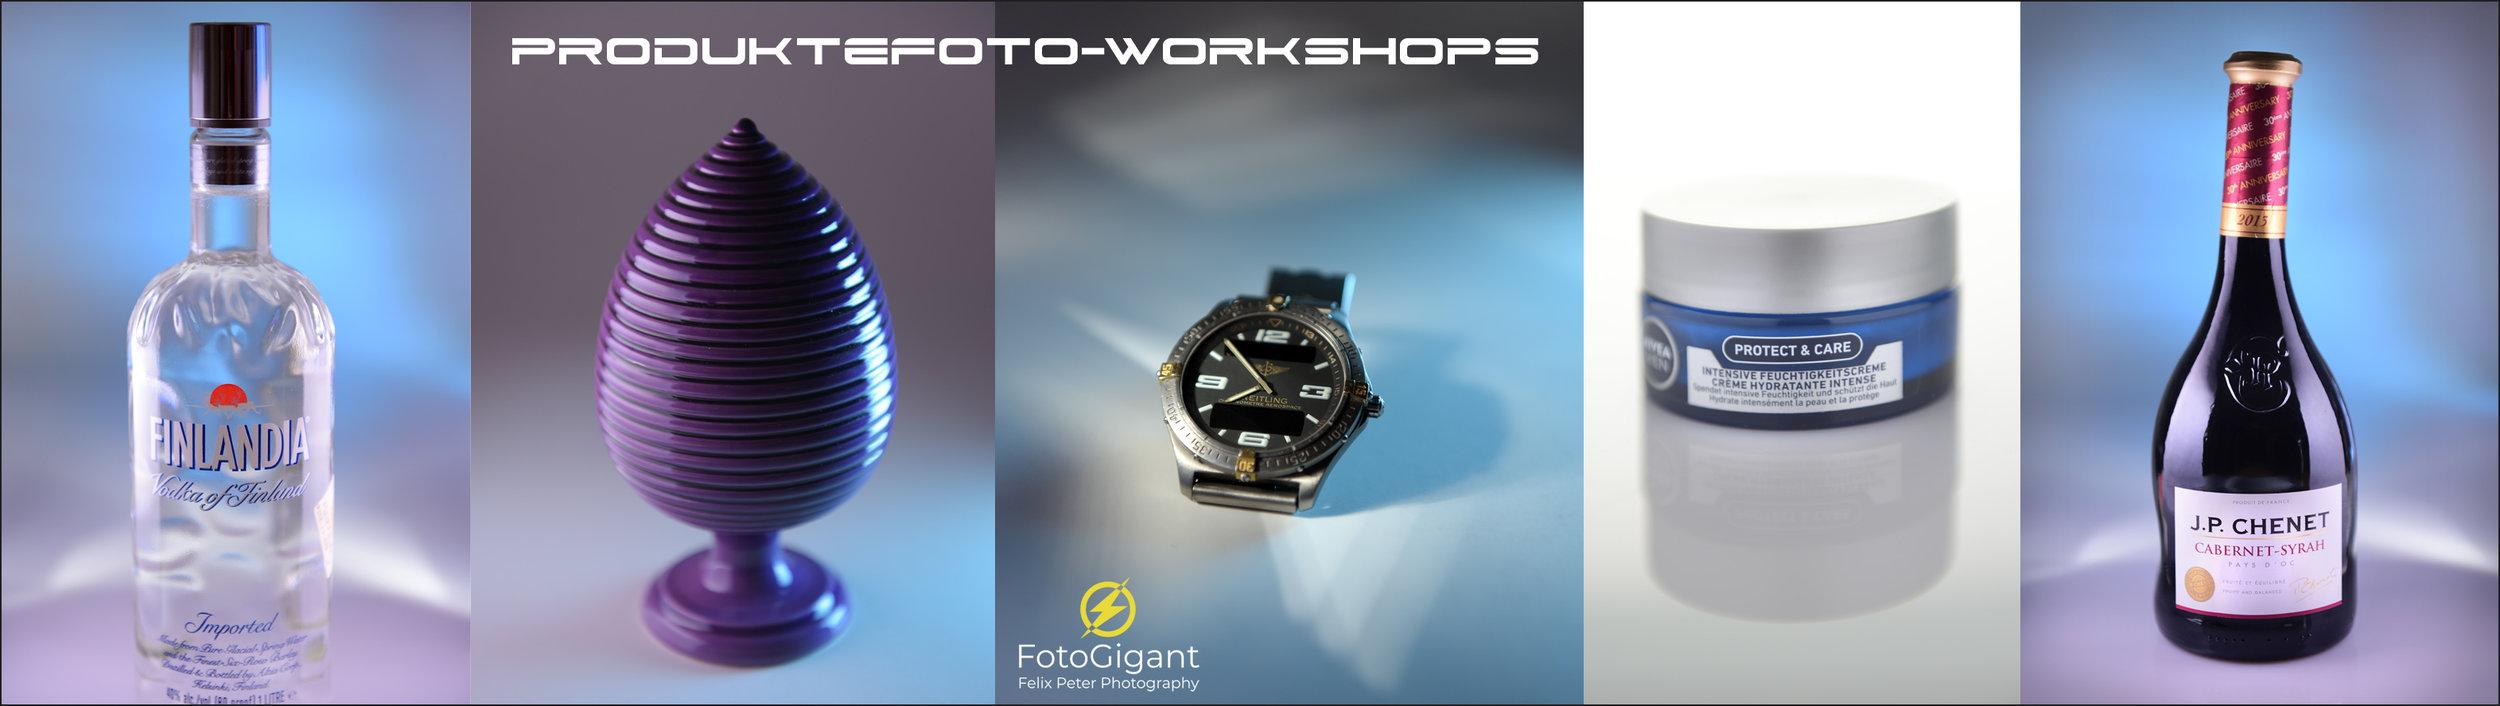 Objektfotografie_Produktefoto-Workshop.jpg